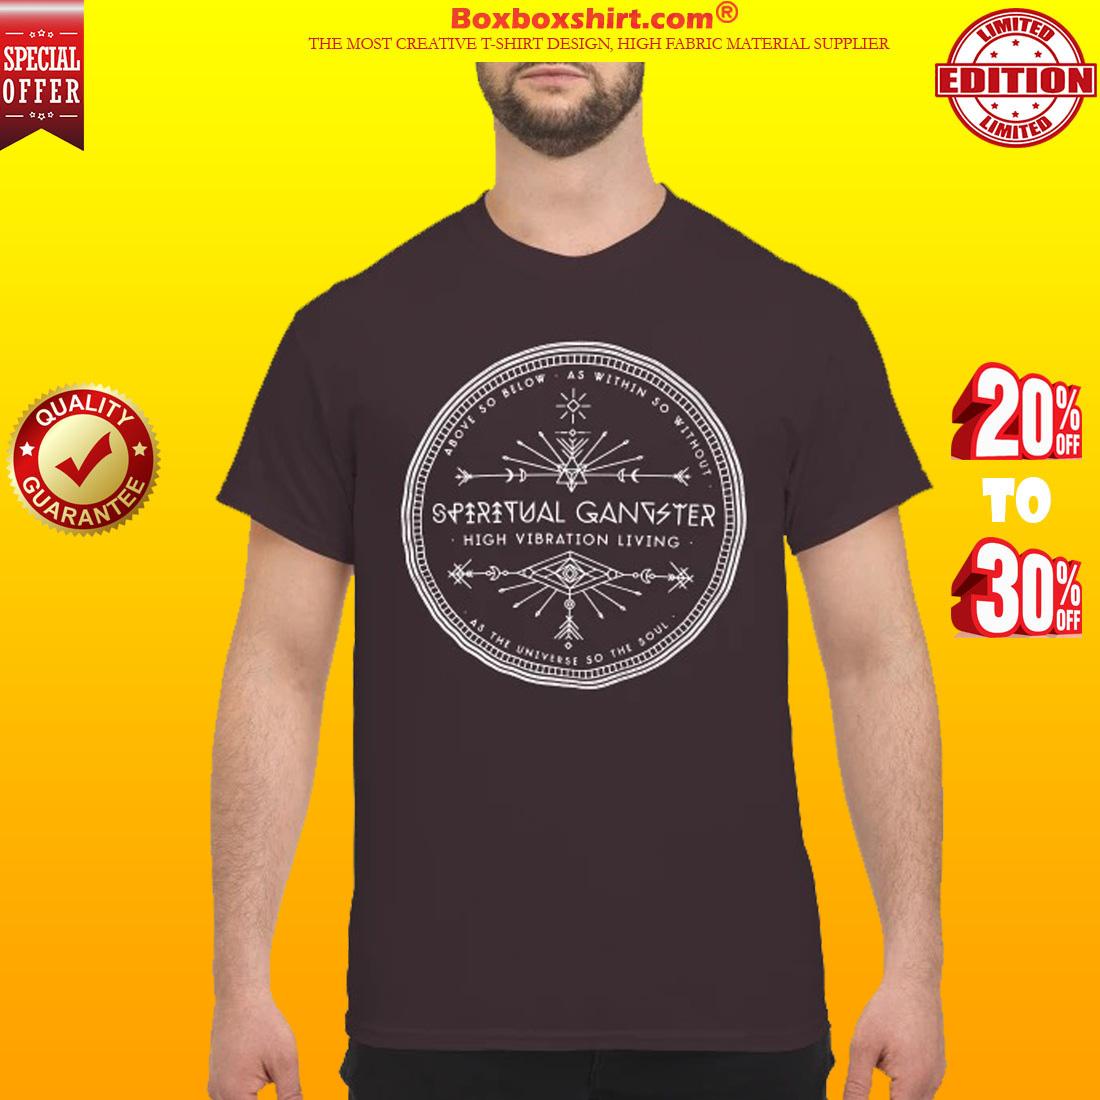 Spiritual gangster high vibration living shirt